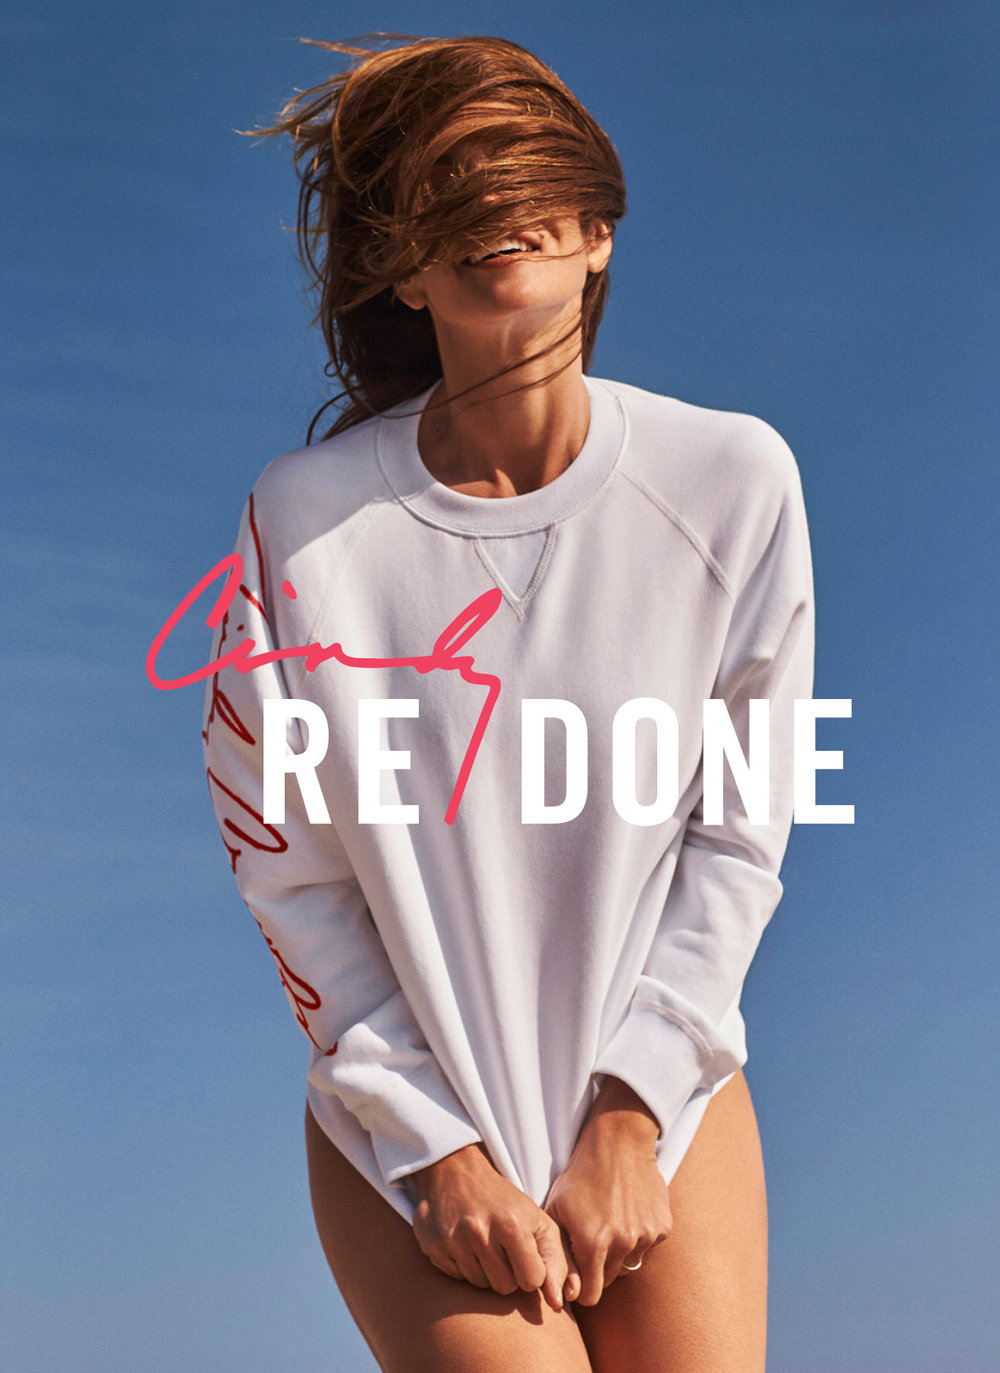 #redone #cindycrawford #fw17 #campaign #fashion #sebastianfaena #jimkaemmerling